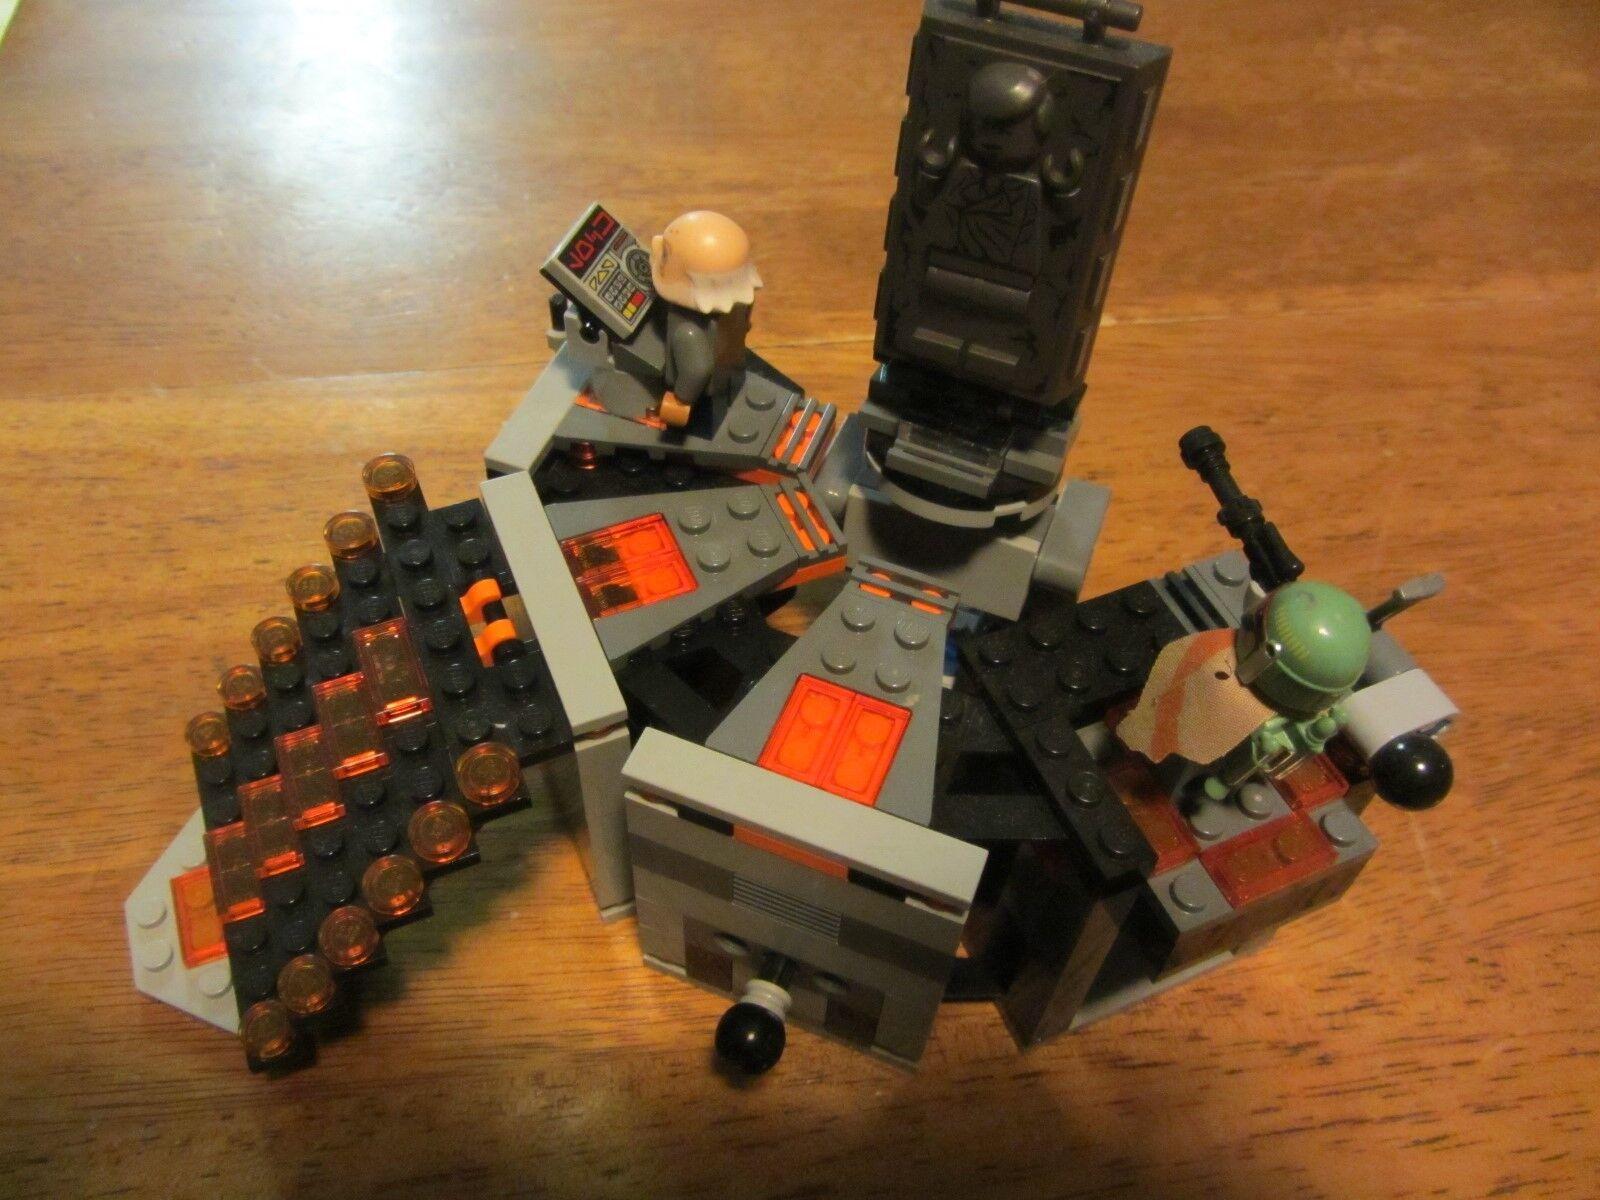 Lego Star Wars set 75137 Carbon Freezing Chamber with Boba Fett